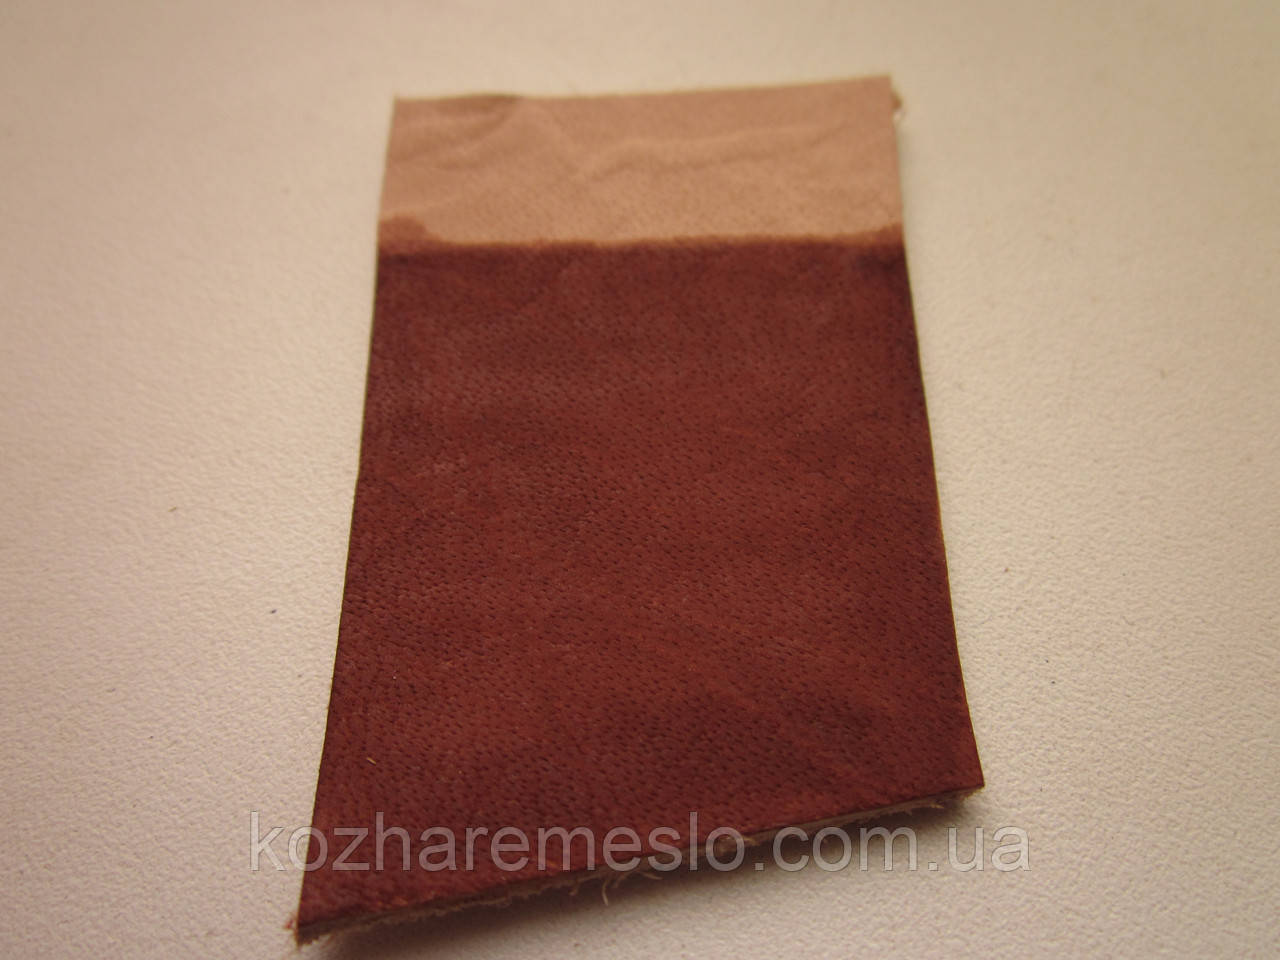 Краска для кожи спиртовая TOLEDO SUPER 50 мл аметистовая (виски)